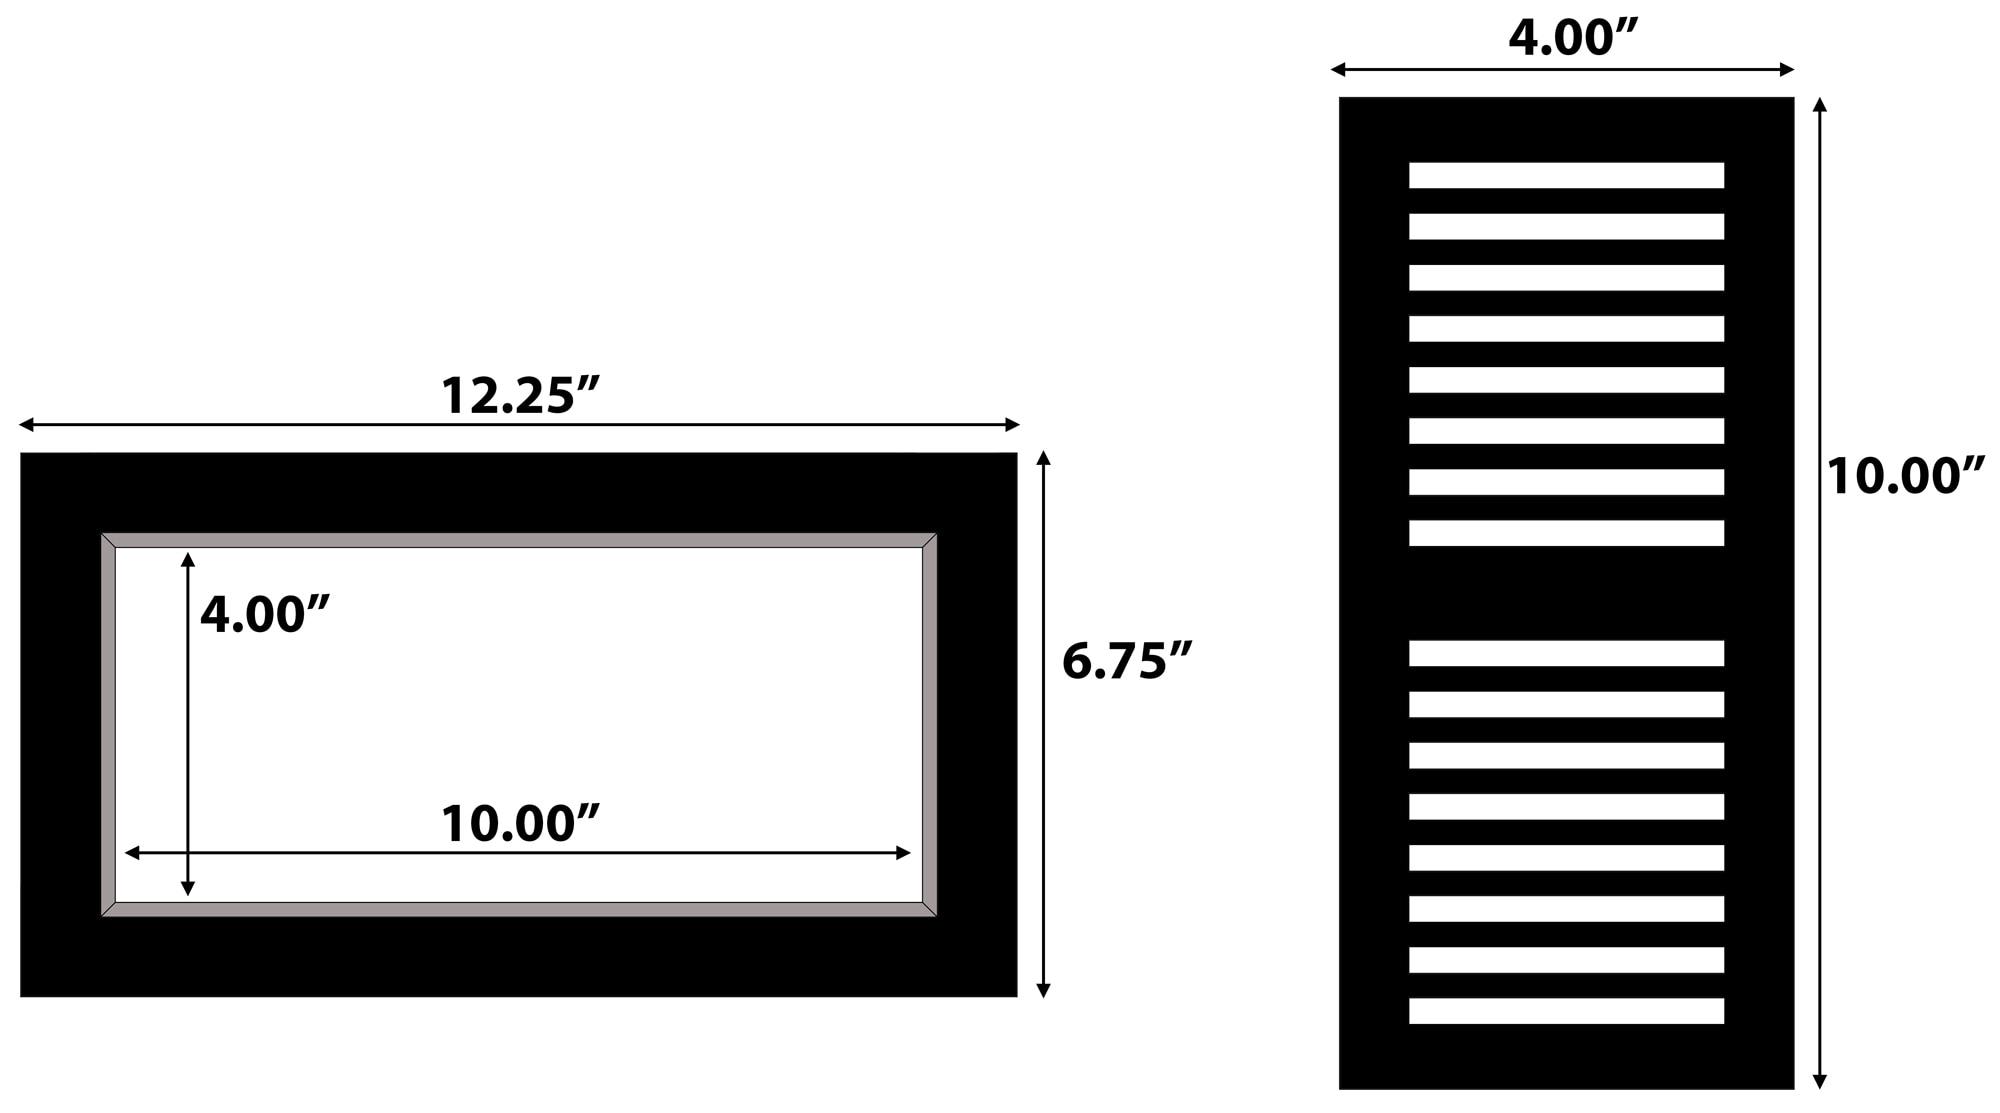 "Loxley / Vent - Flush Mount (564) / 10"" x 4"" x 5/8"" Engineered Hardwood Moldings - European Oak Whitewash - Loxley 0"